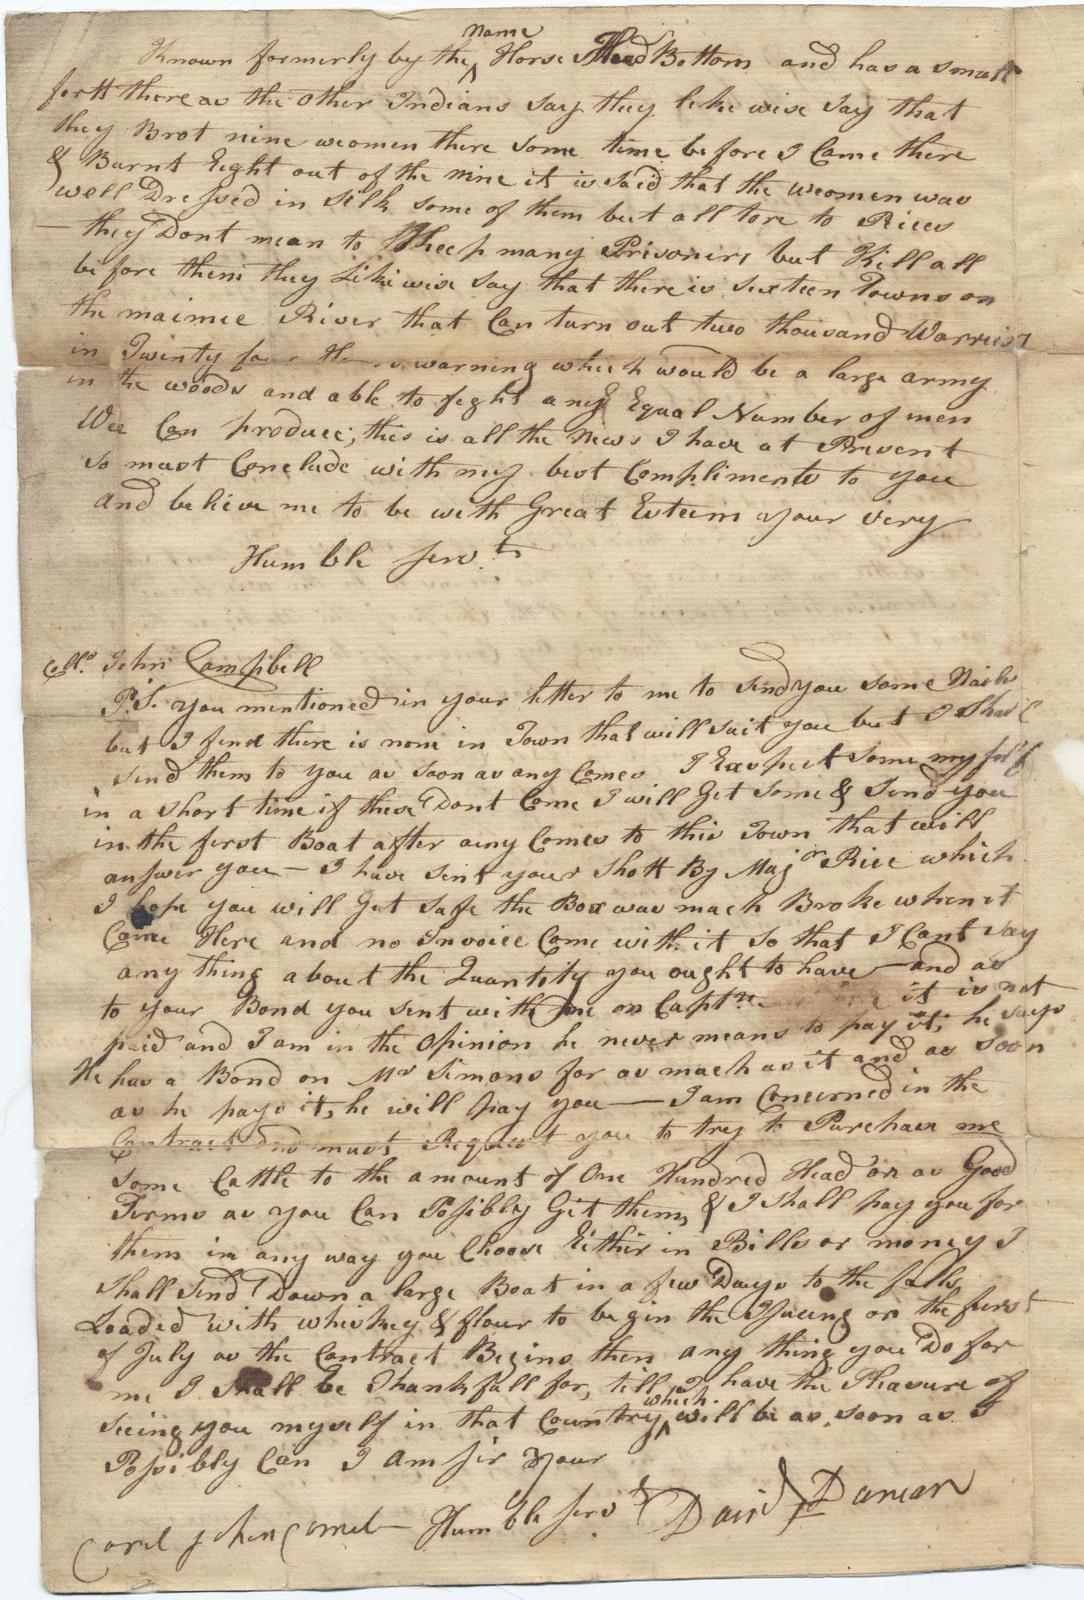 Letter from Daniel Duncan to John Campbell